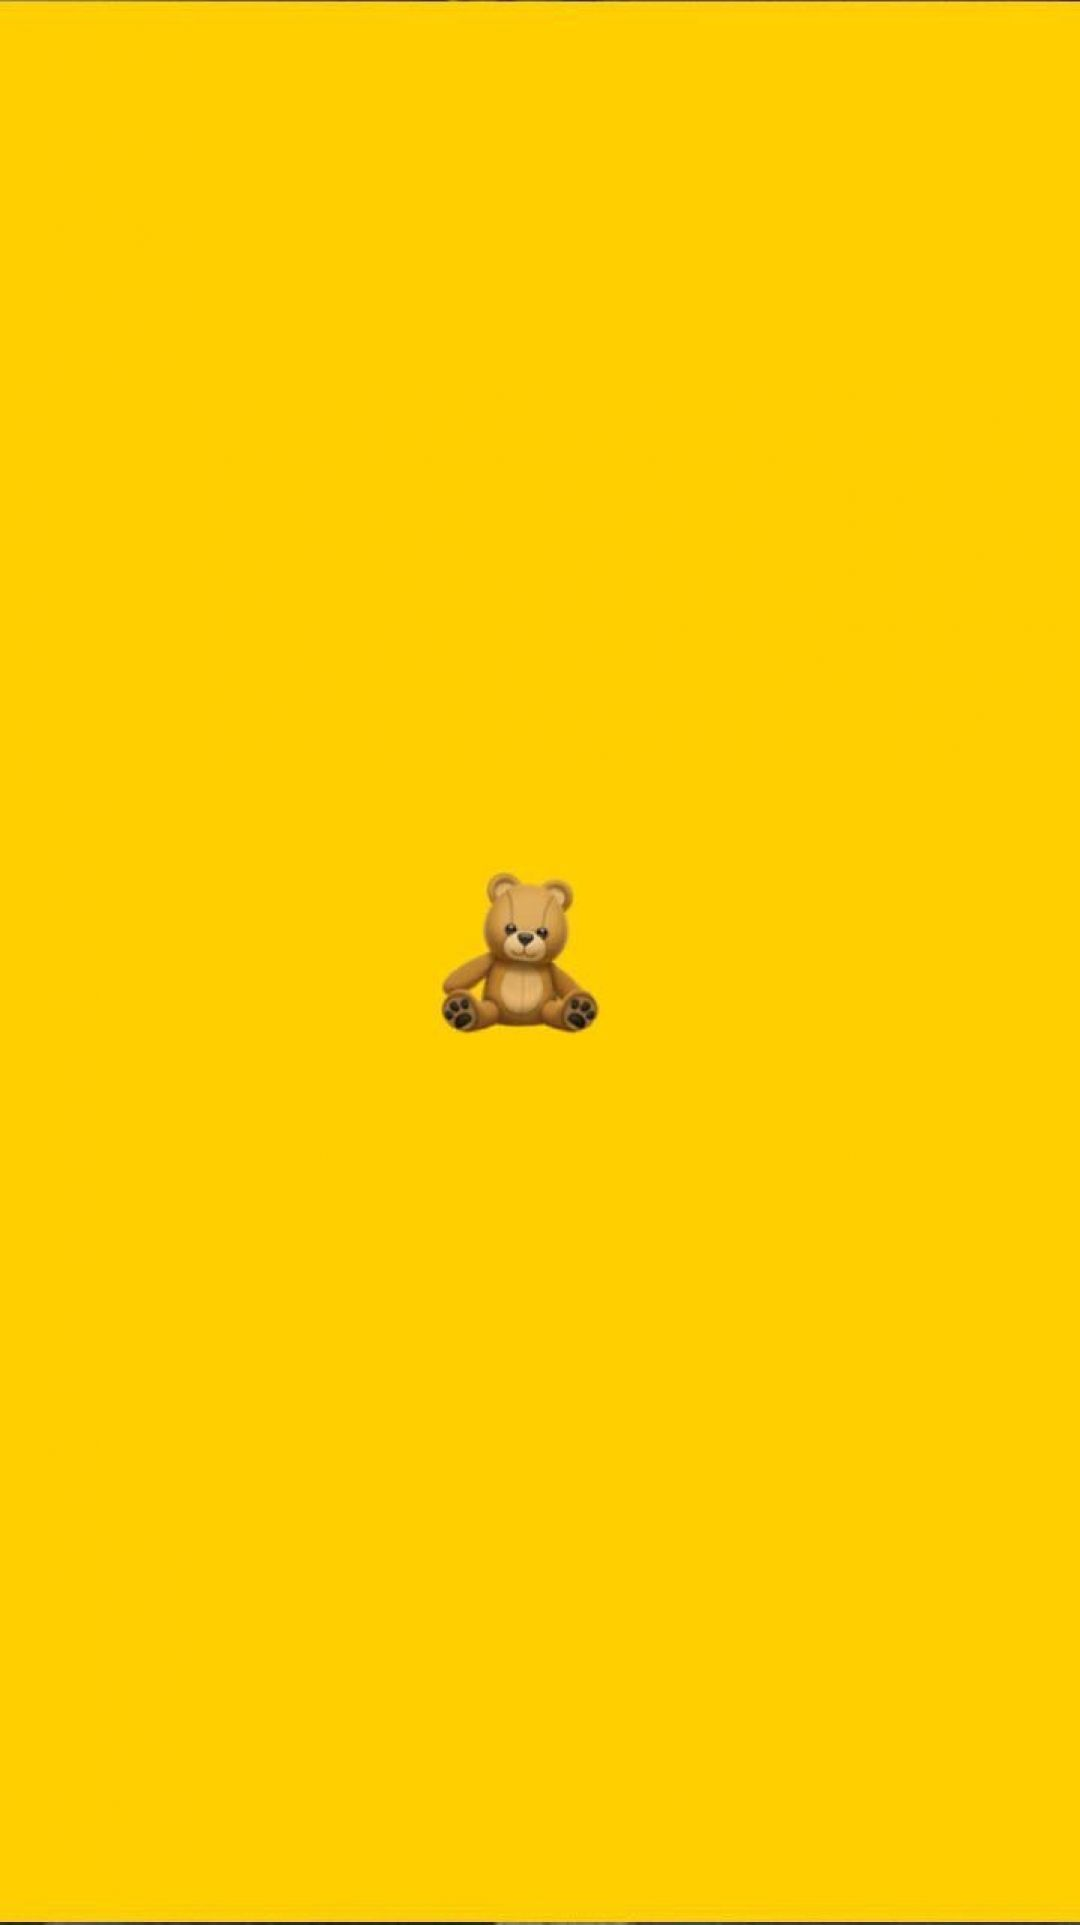 emoji aesthetic wallpapers